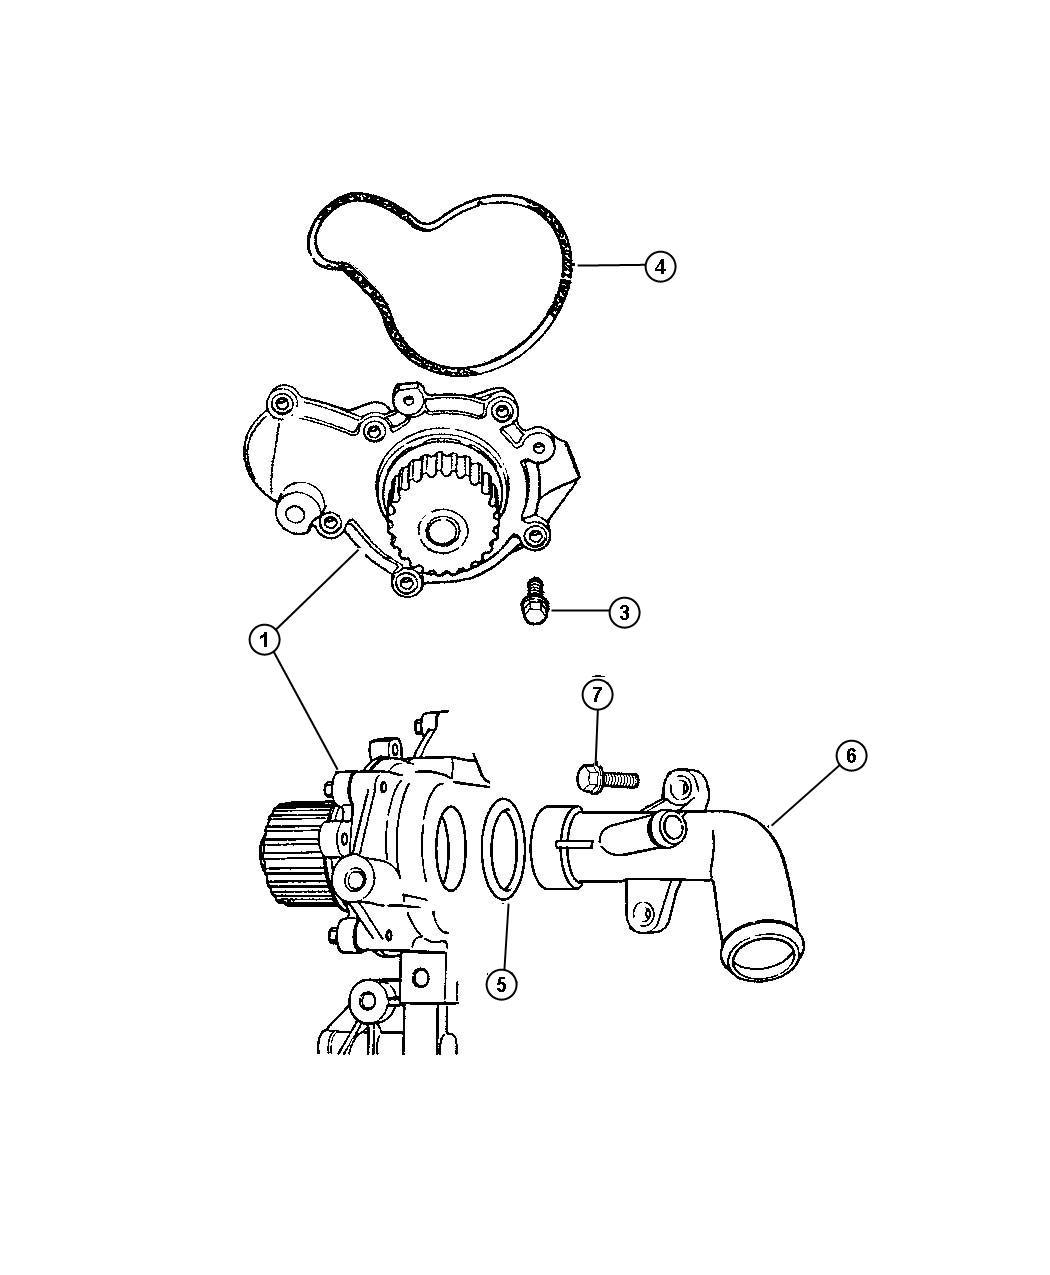 Jeep Wrangler Pump Water 2 0l I4 Dohc 16v Smpi Engine